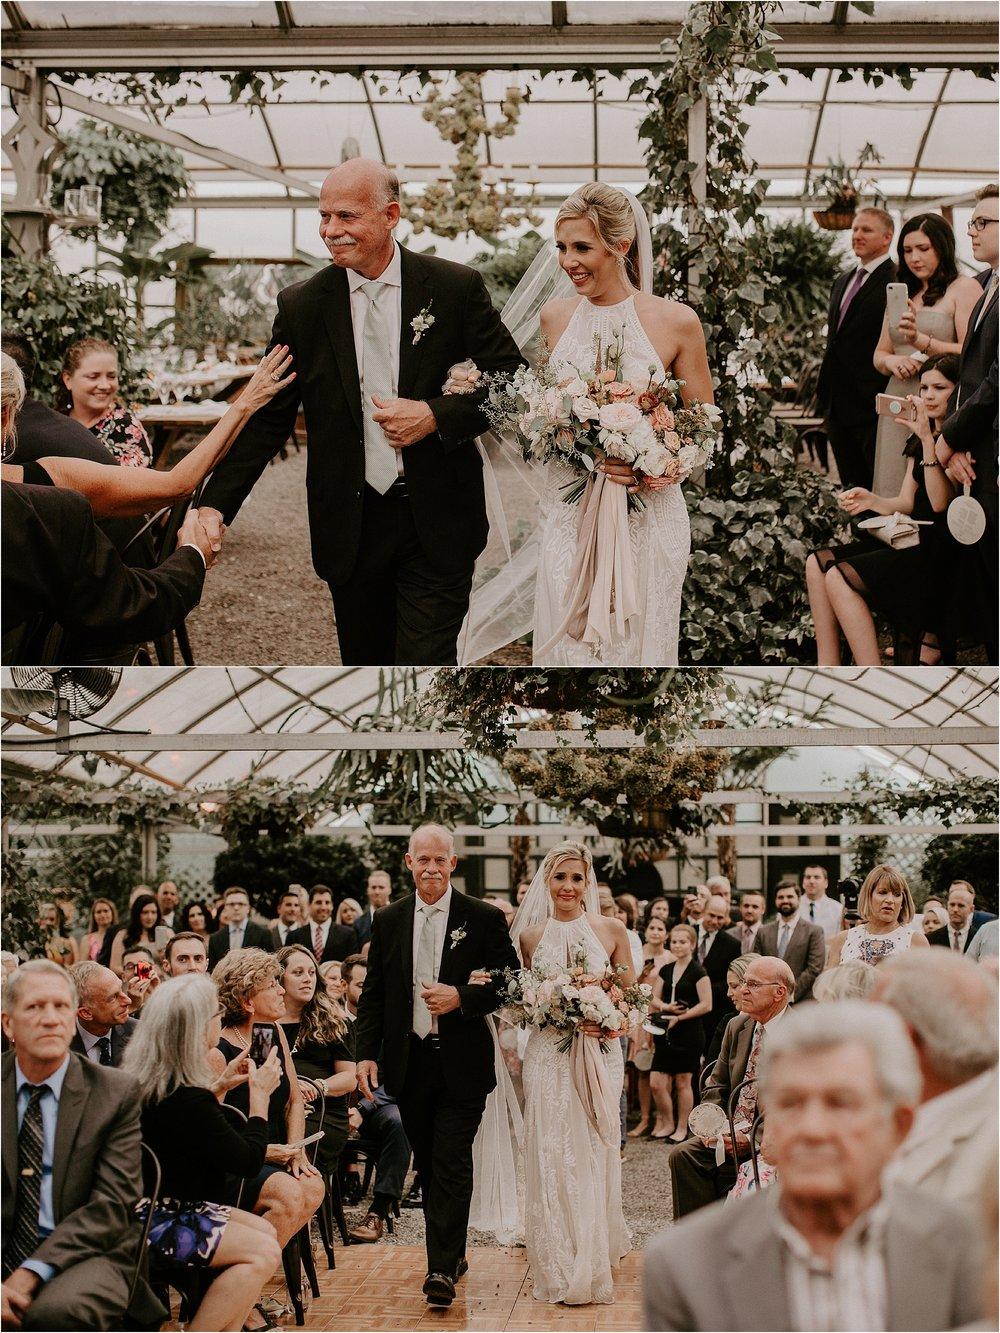 Sarah_Brookhart_Hortulus_Farm_Garden_and_Nursey_Wedding_Photographer_0045.jpg